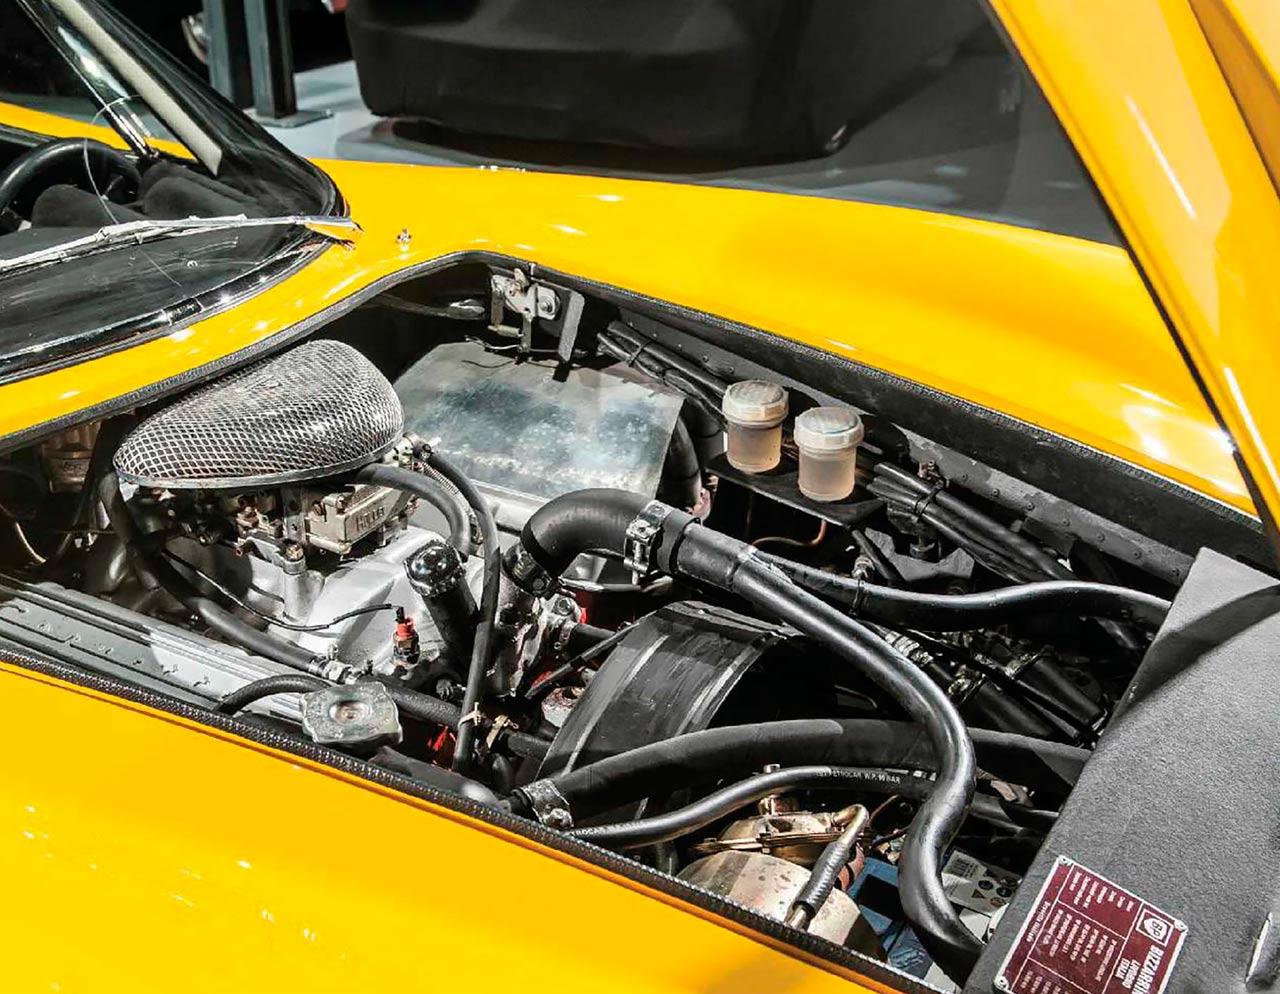 1966 Bizzarrini 5300 GT Strada engine V8